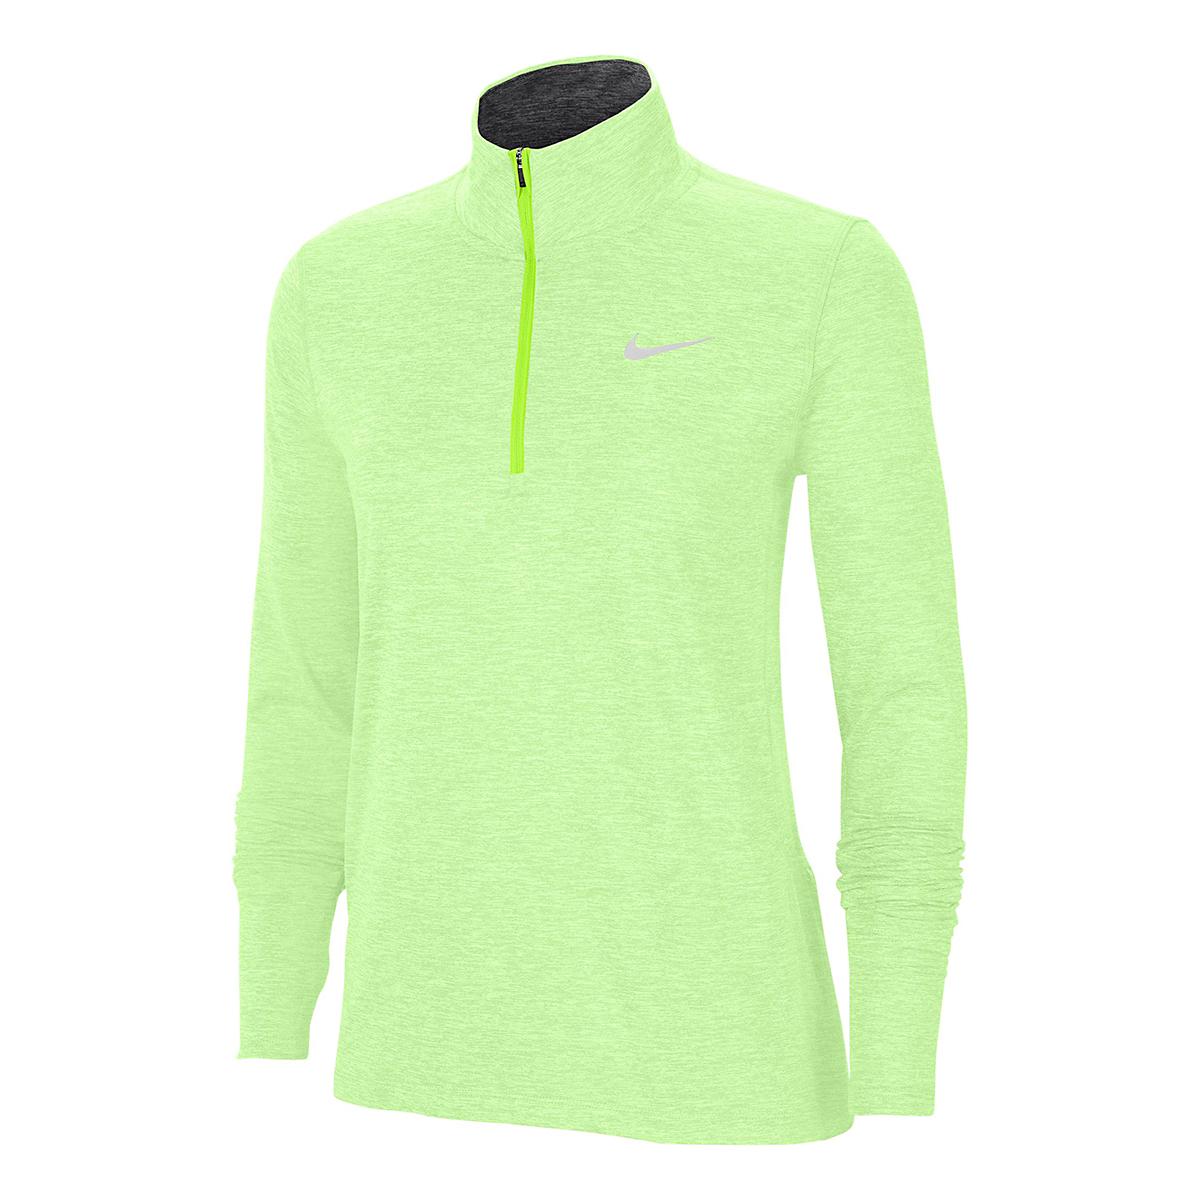 Women's Nike Element Top 1/2 Zip Long Sleeve - Color: Volt/Barely Volt/Htr/Reflective Silver - Size: XS, Volt/Barely Volt/Htr/Reflective Silver, large, image 1